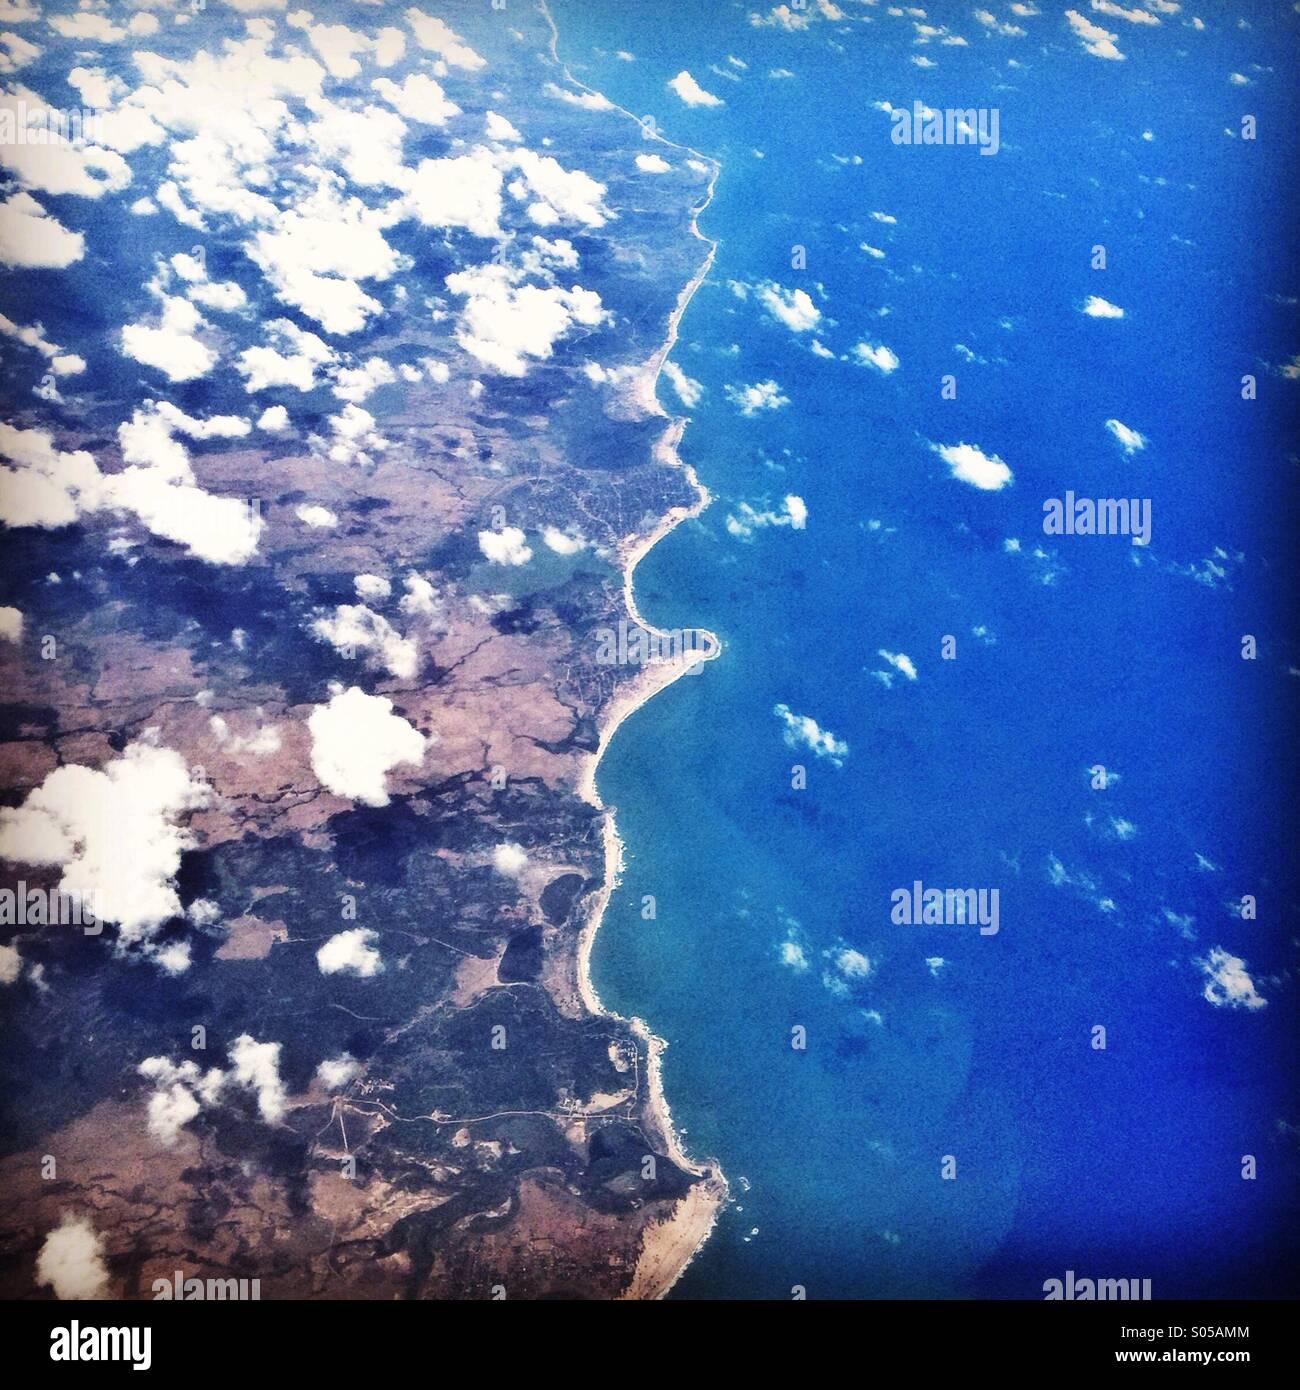 Sri Lanka coastline - Stock Image